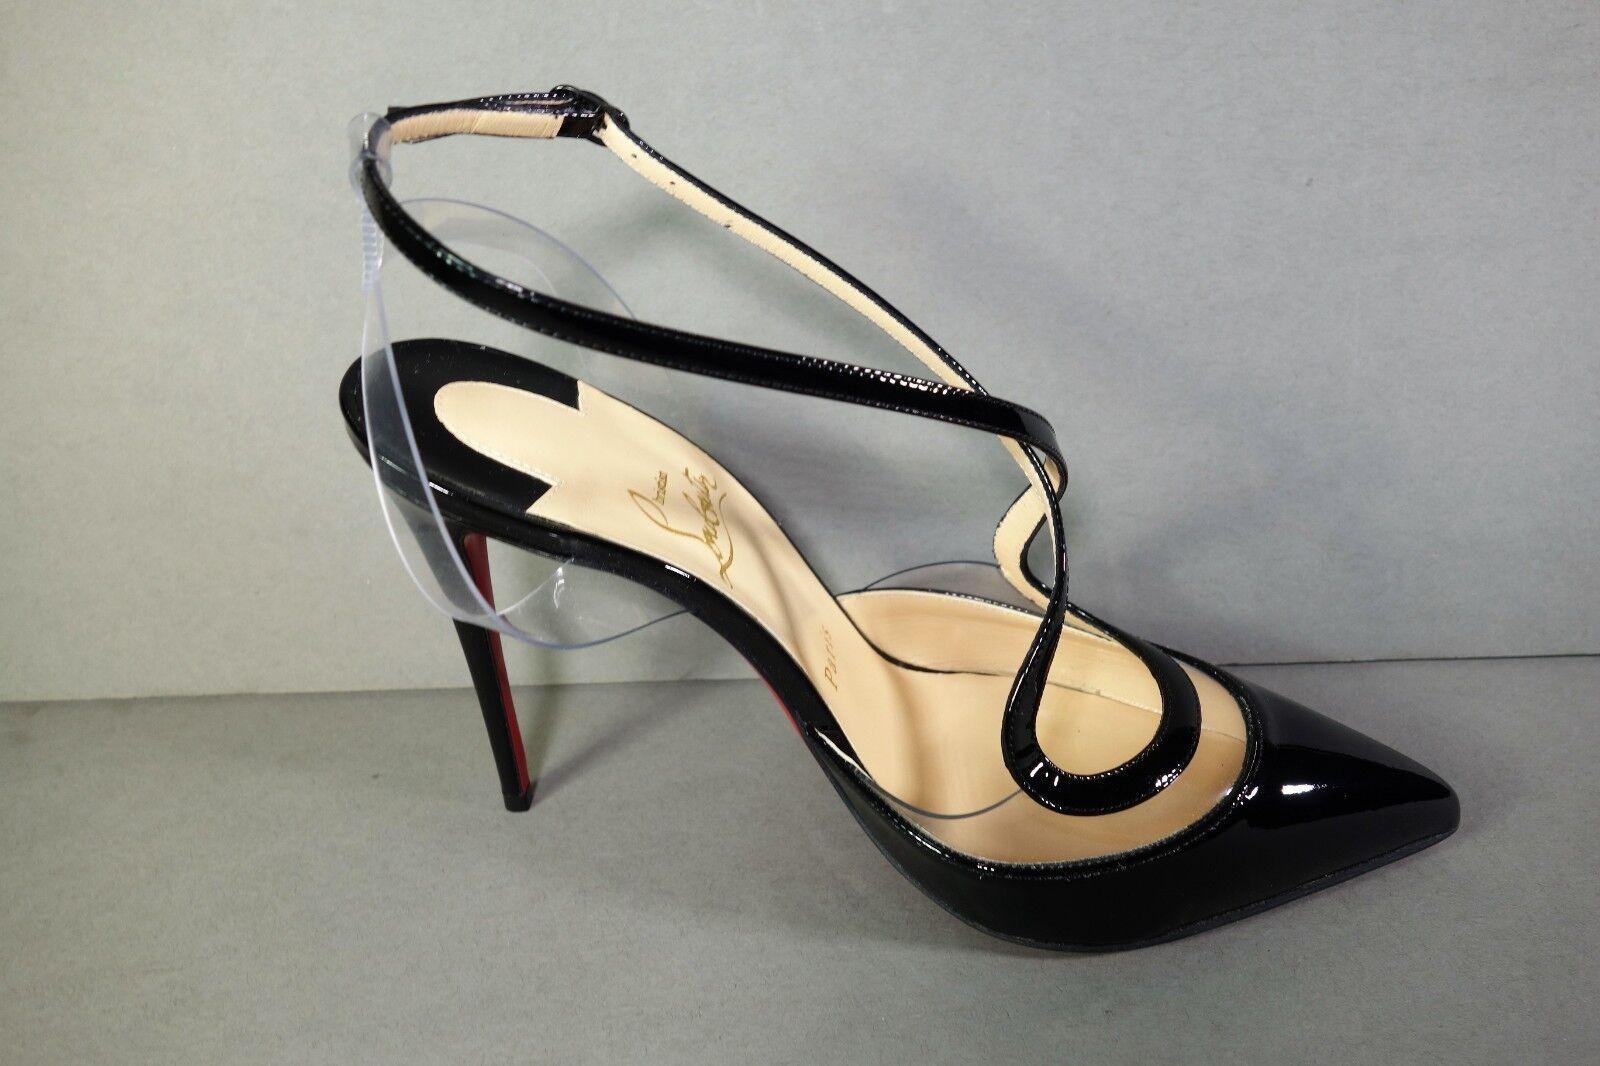 LOUBOUTIN 36 CUPIDETTA 100 Black Patent PVC Point Point Point Toe Pumps shoes Slingbacks NEW 71d165